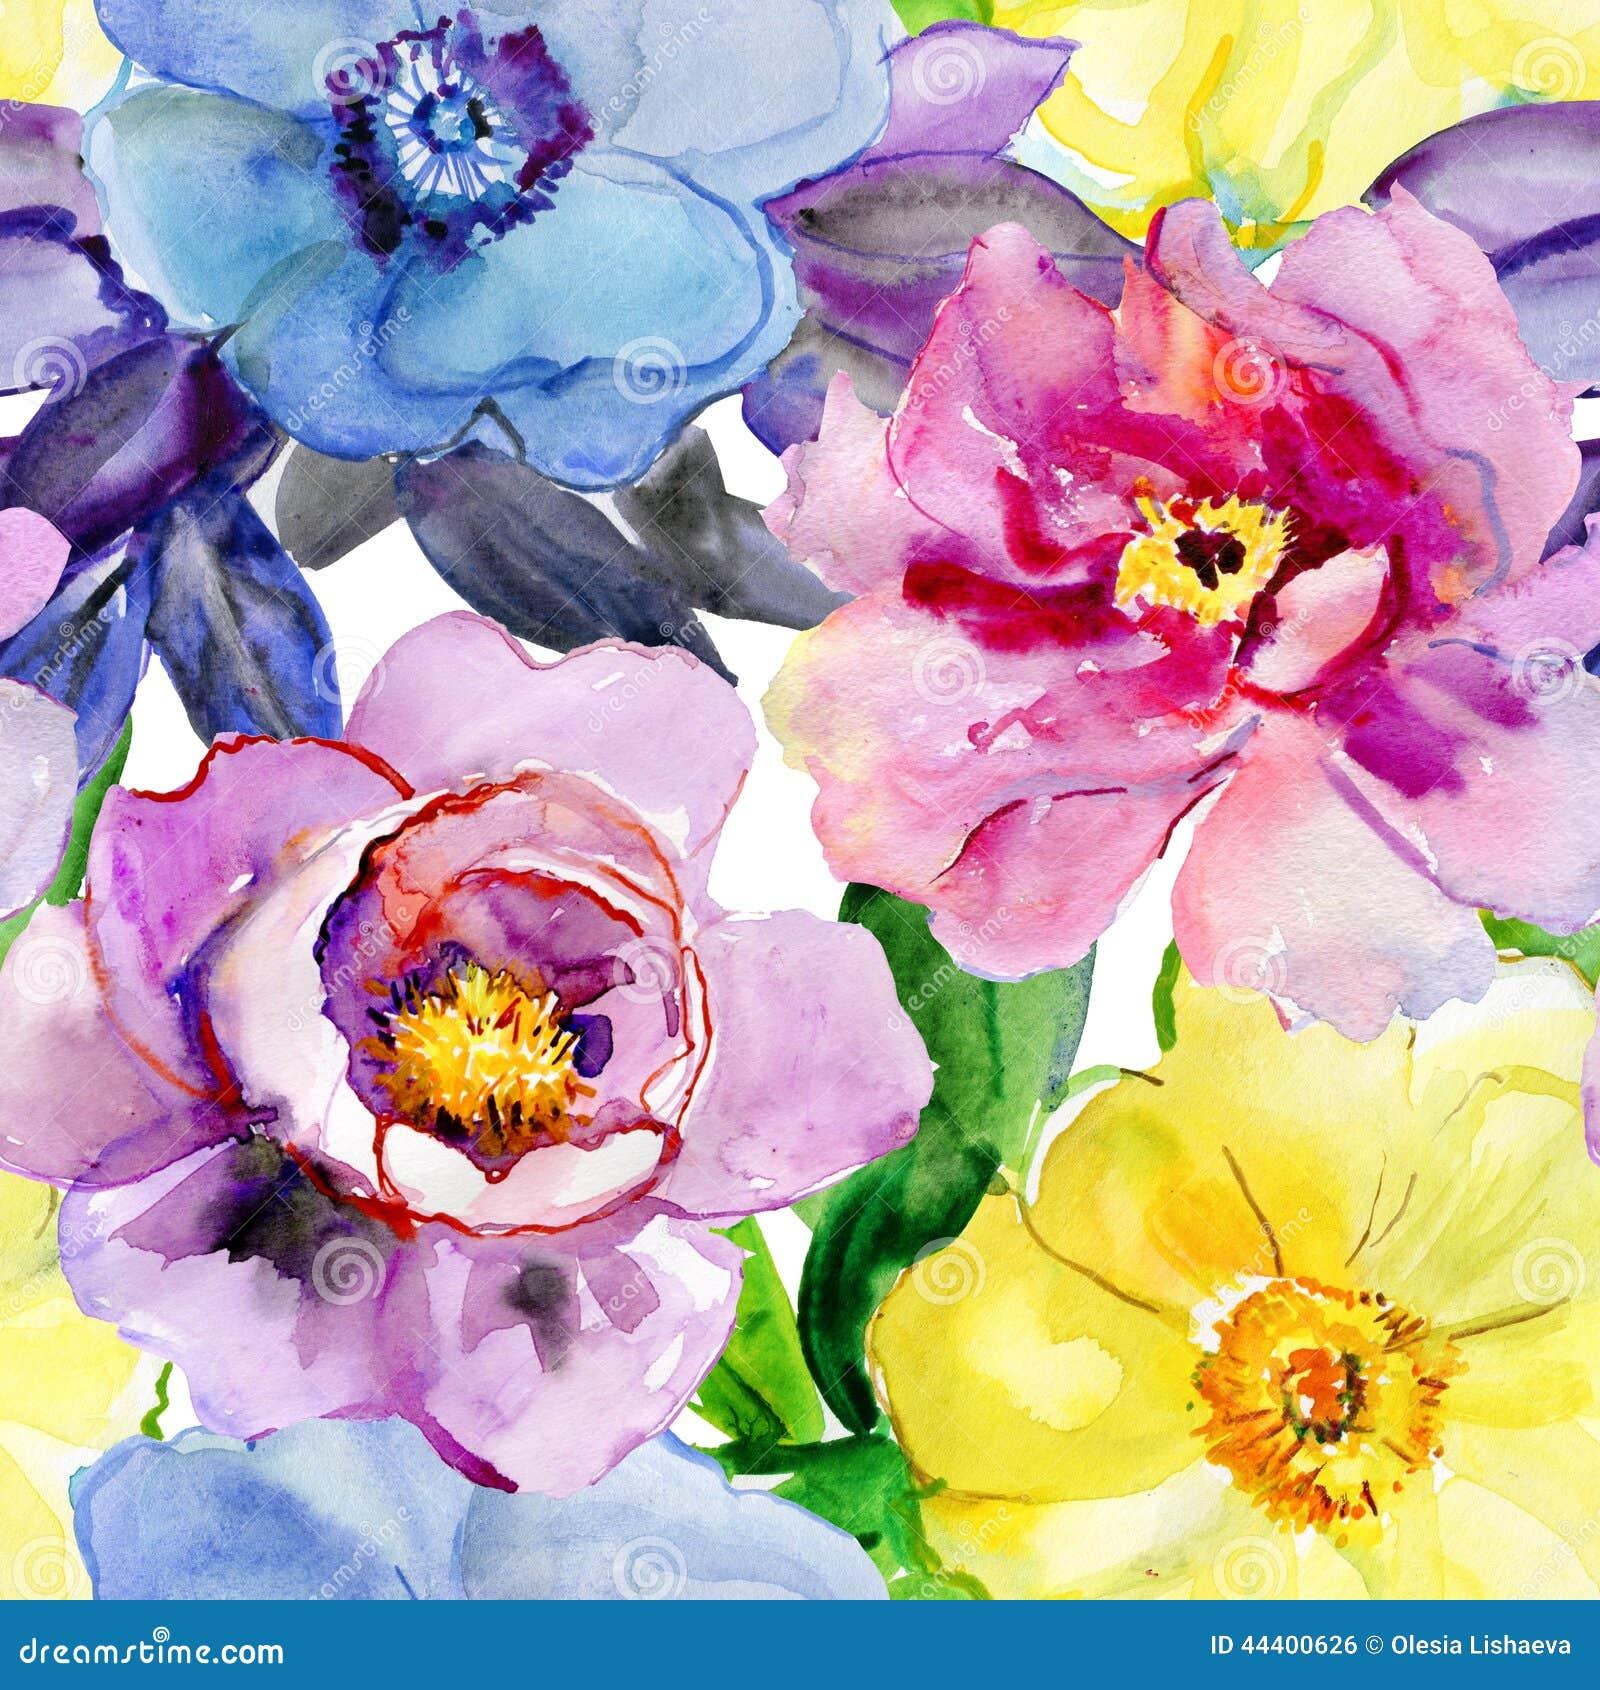 Beautiful flowers, watercolor illustration.